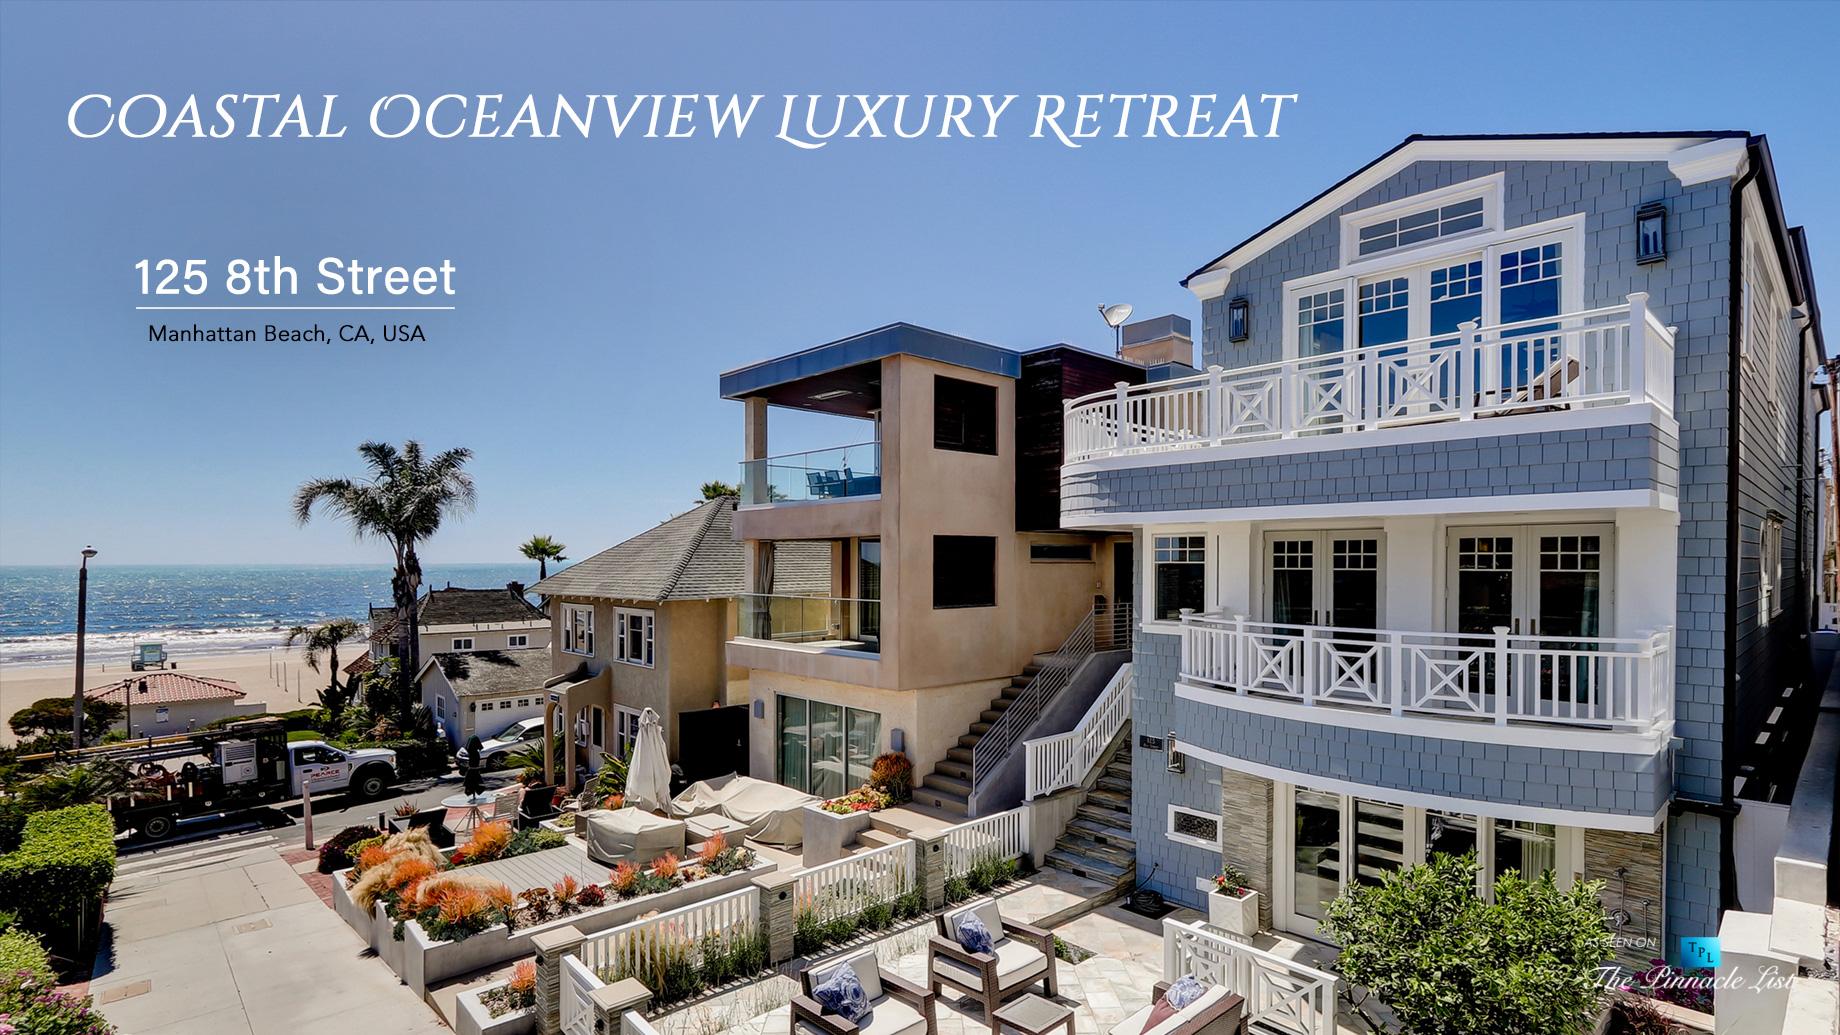 Coastal Oceanview Luxury Retreat - 125 8th St, Manhattan Beach, CA, USA